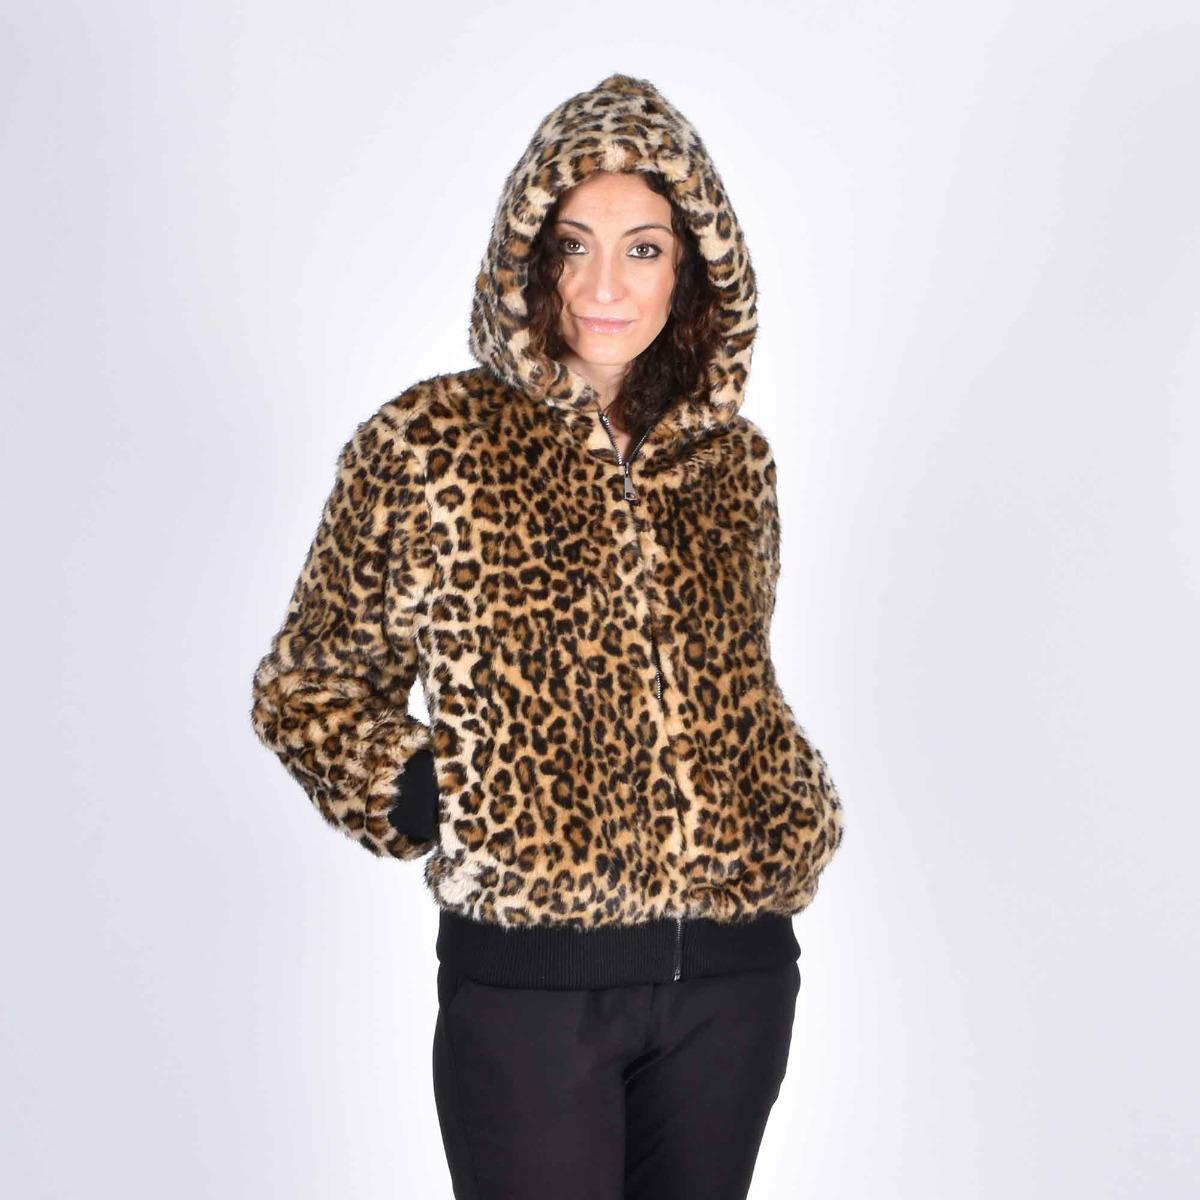 Pelliccia leopardo - Beige